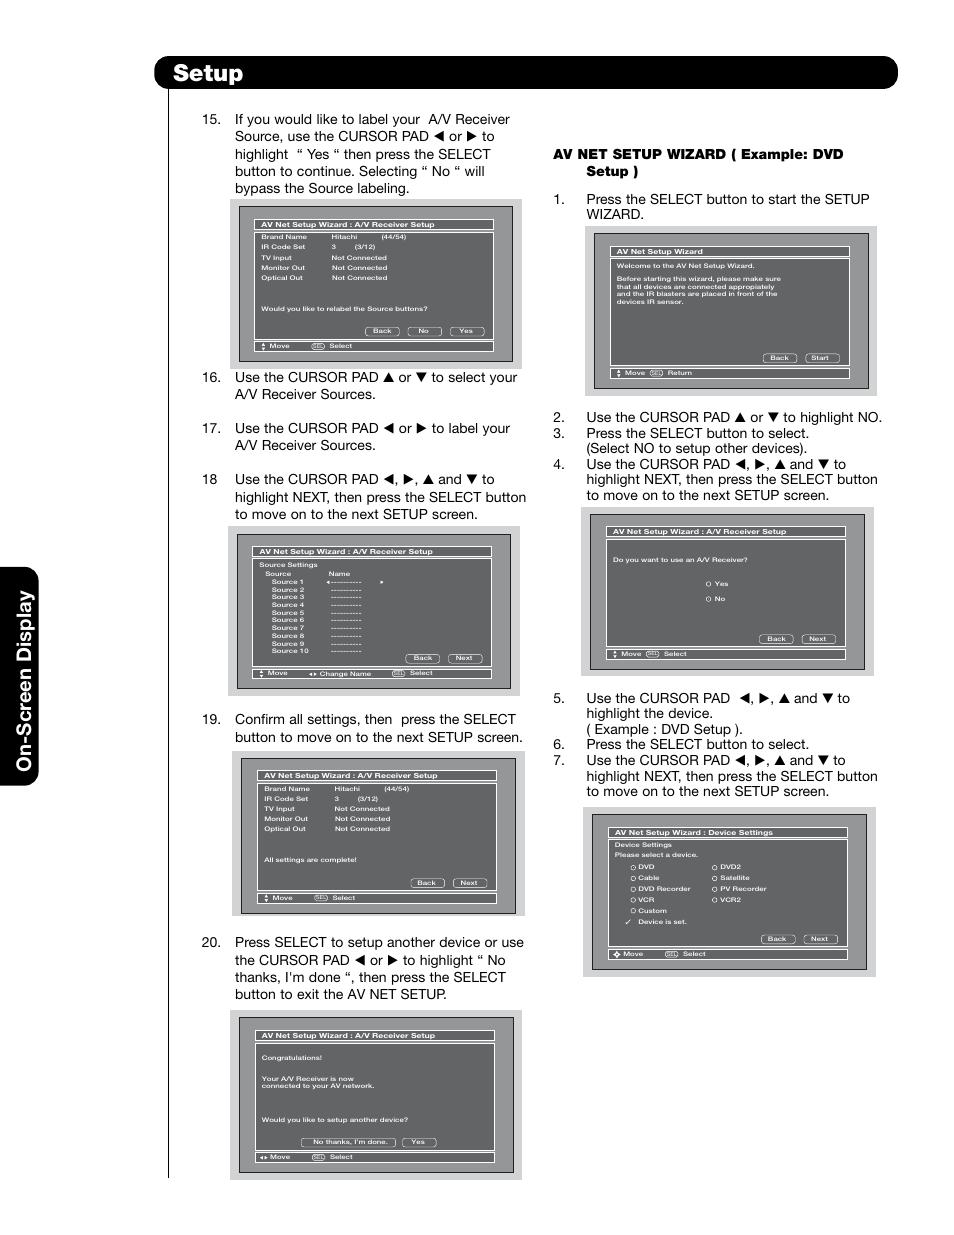 setup on scr een display hitachi 55hdt79 user manual page 70 rh manualsdir com Honeywell Pressuretrol Manual Honeywell Pressuretrol Manual